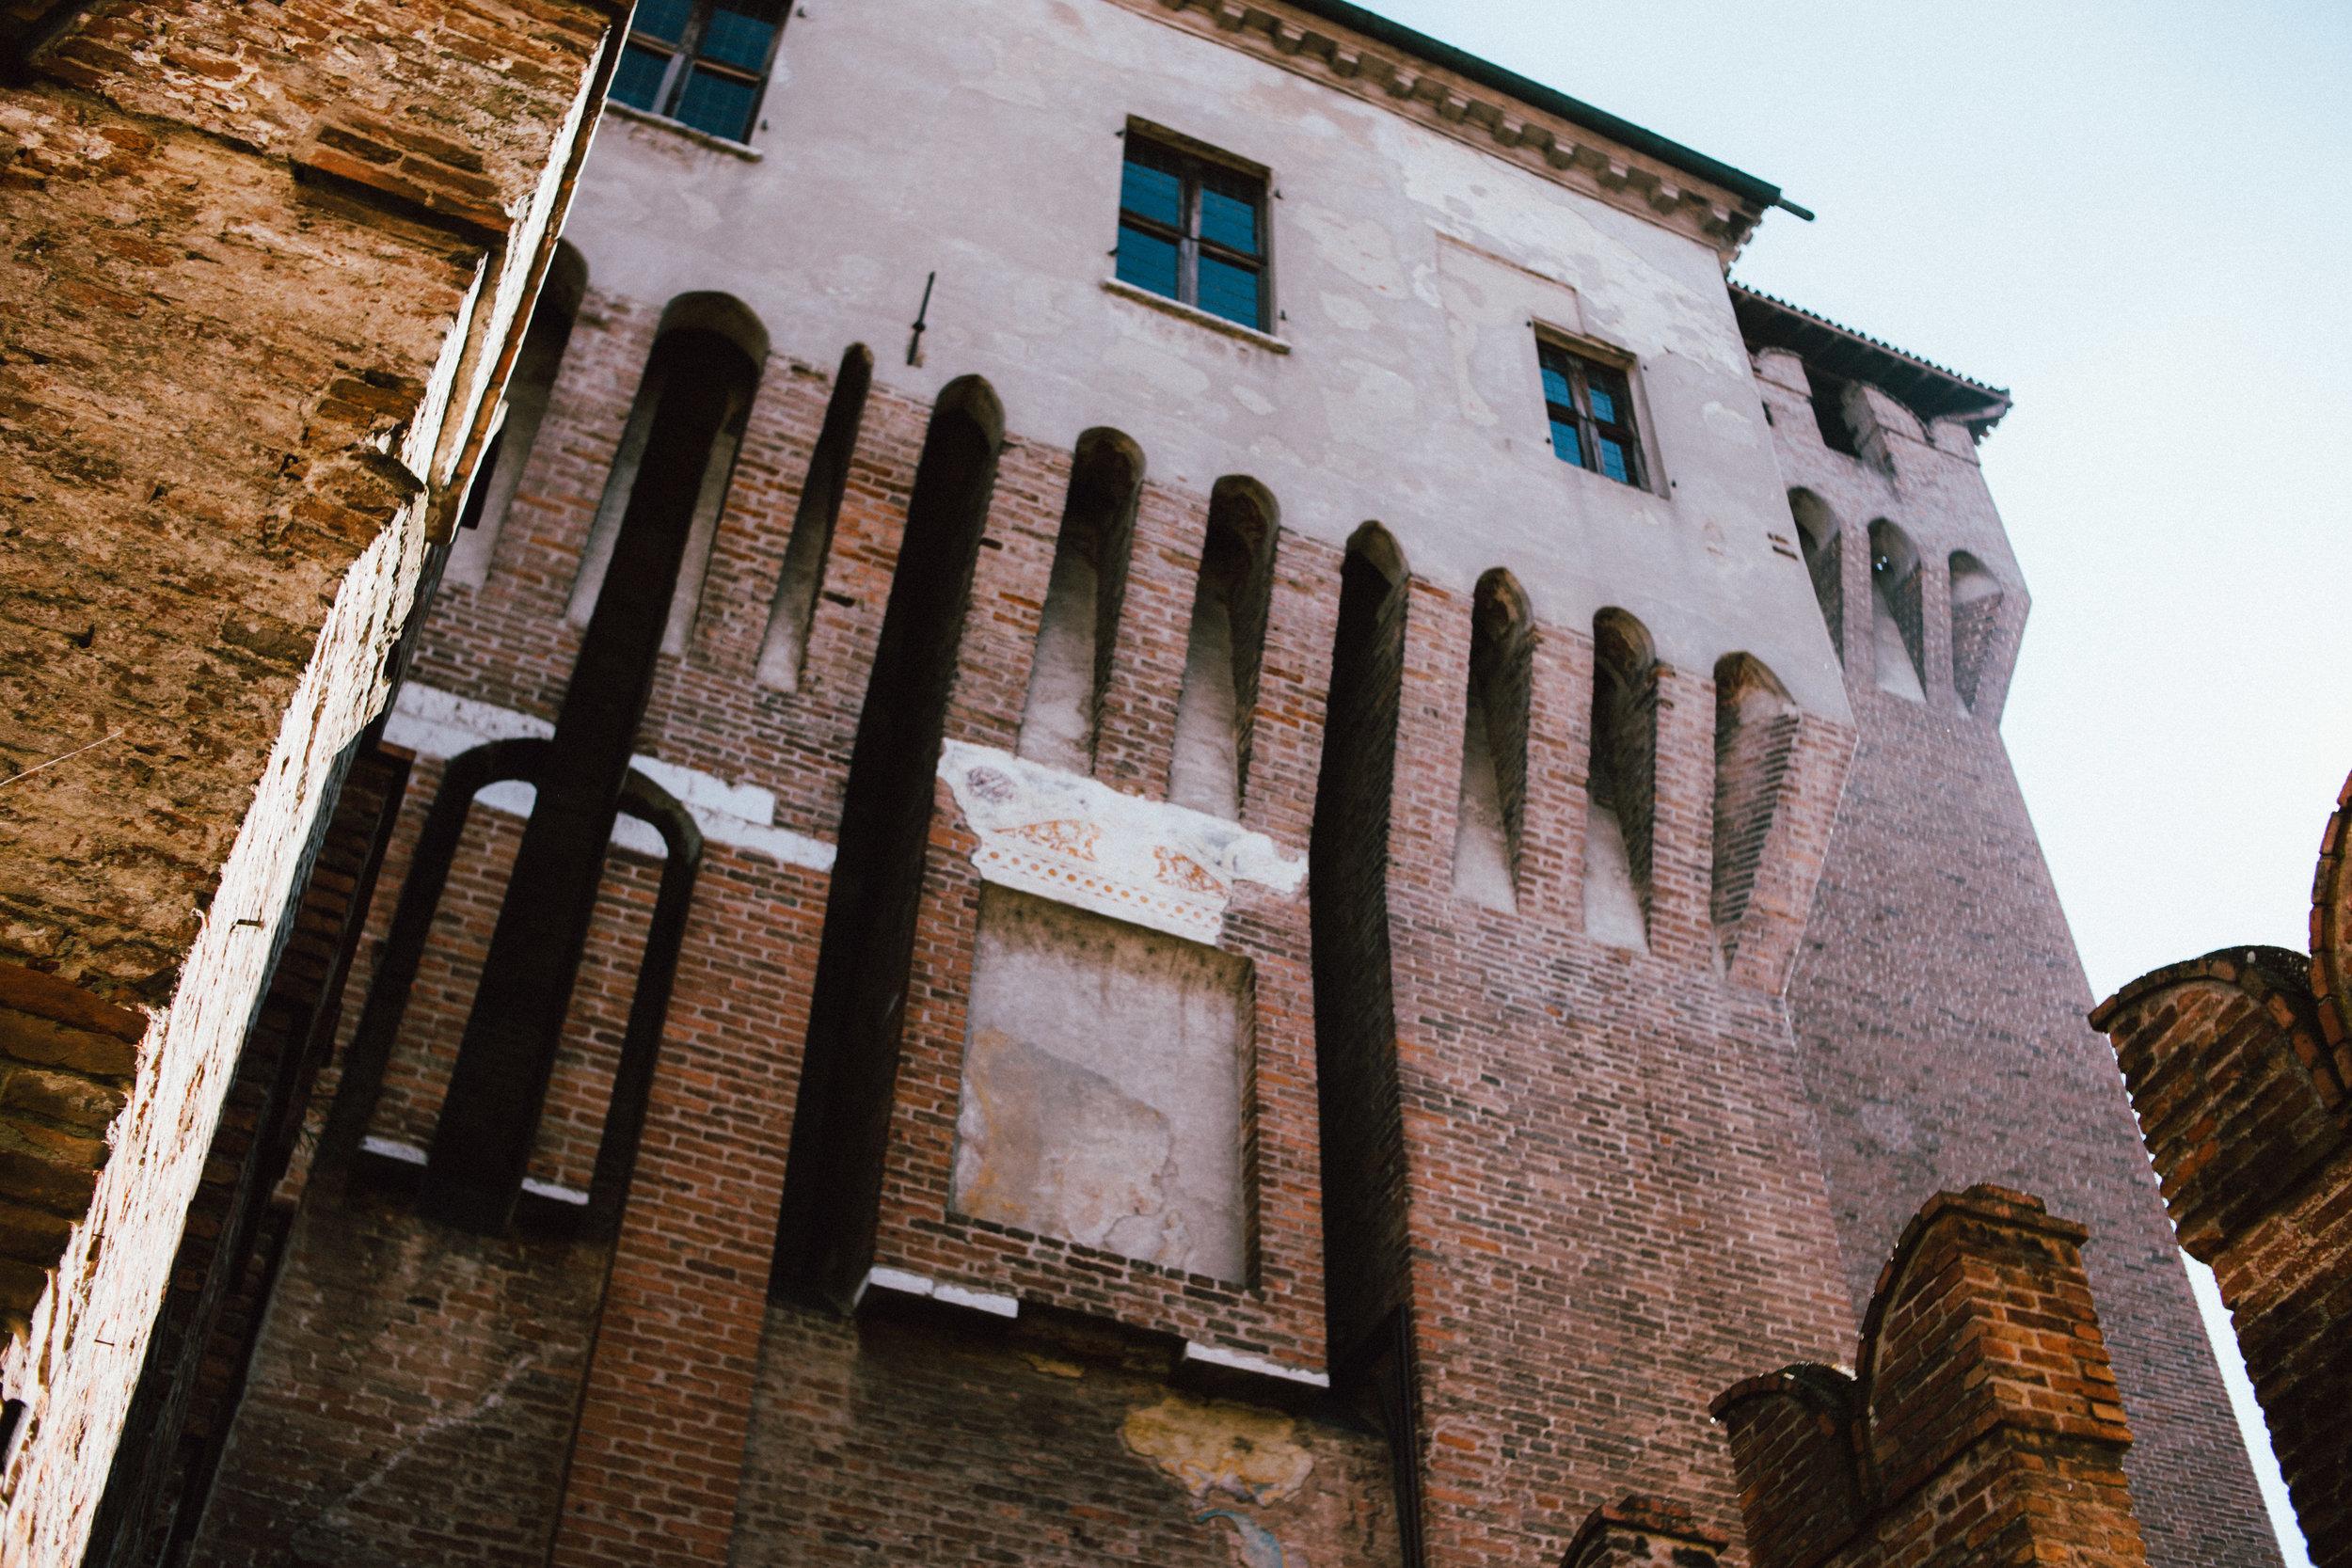 017 - Mantova.jpg